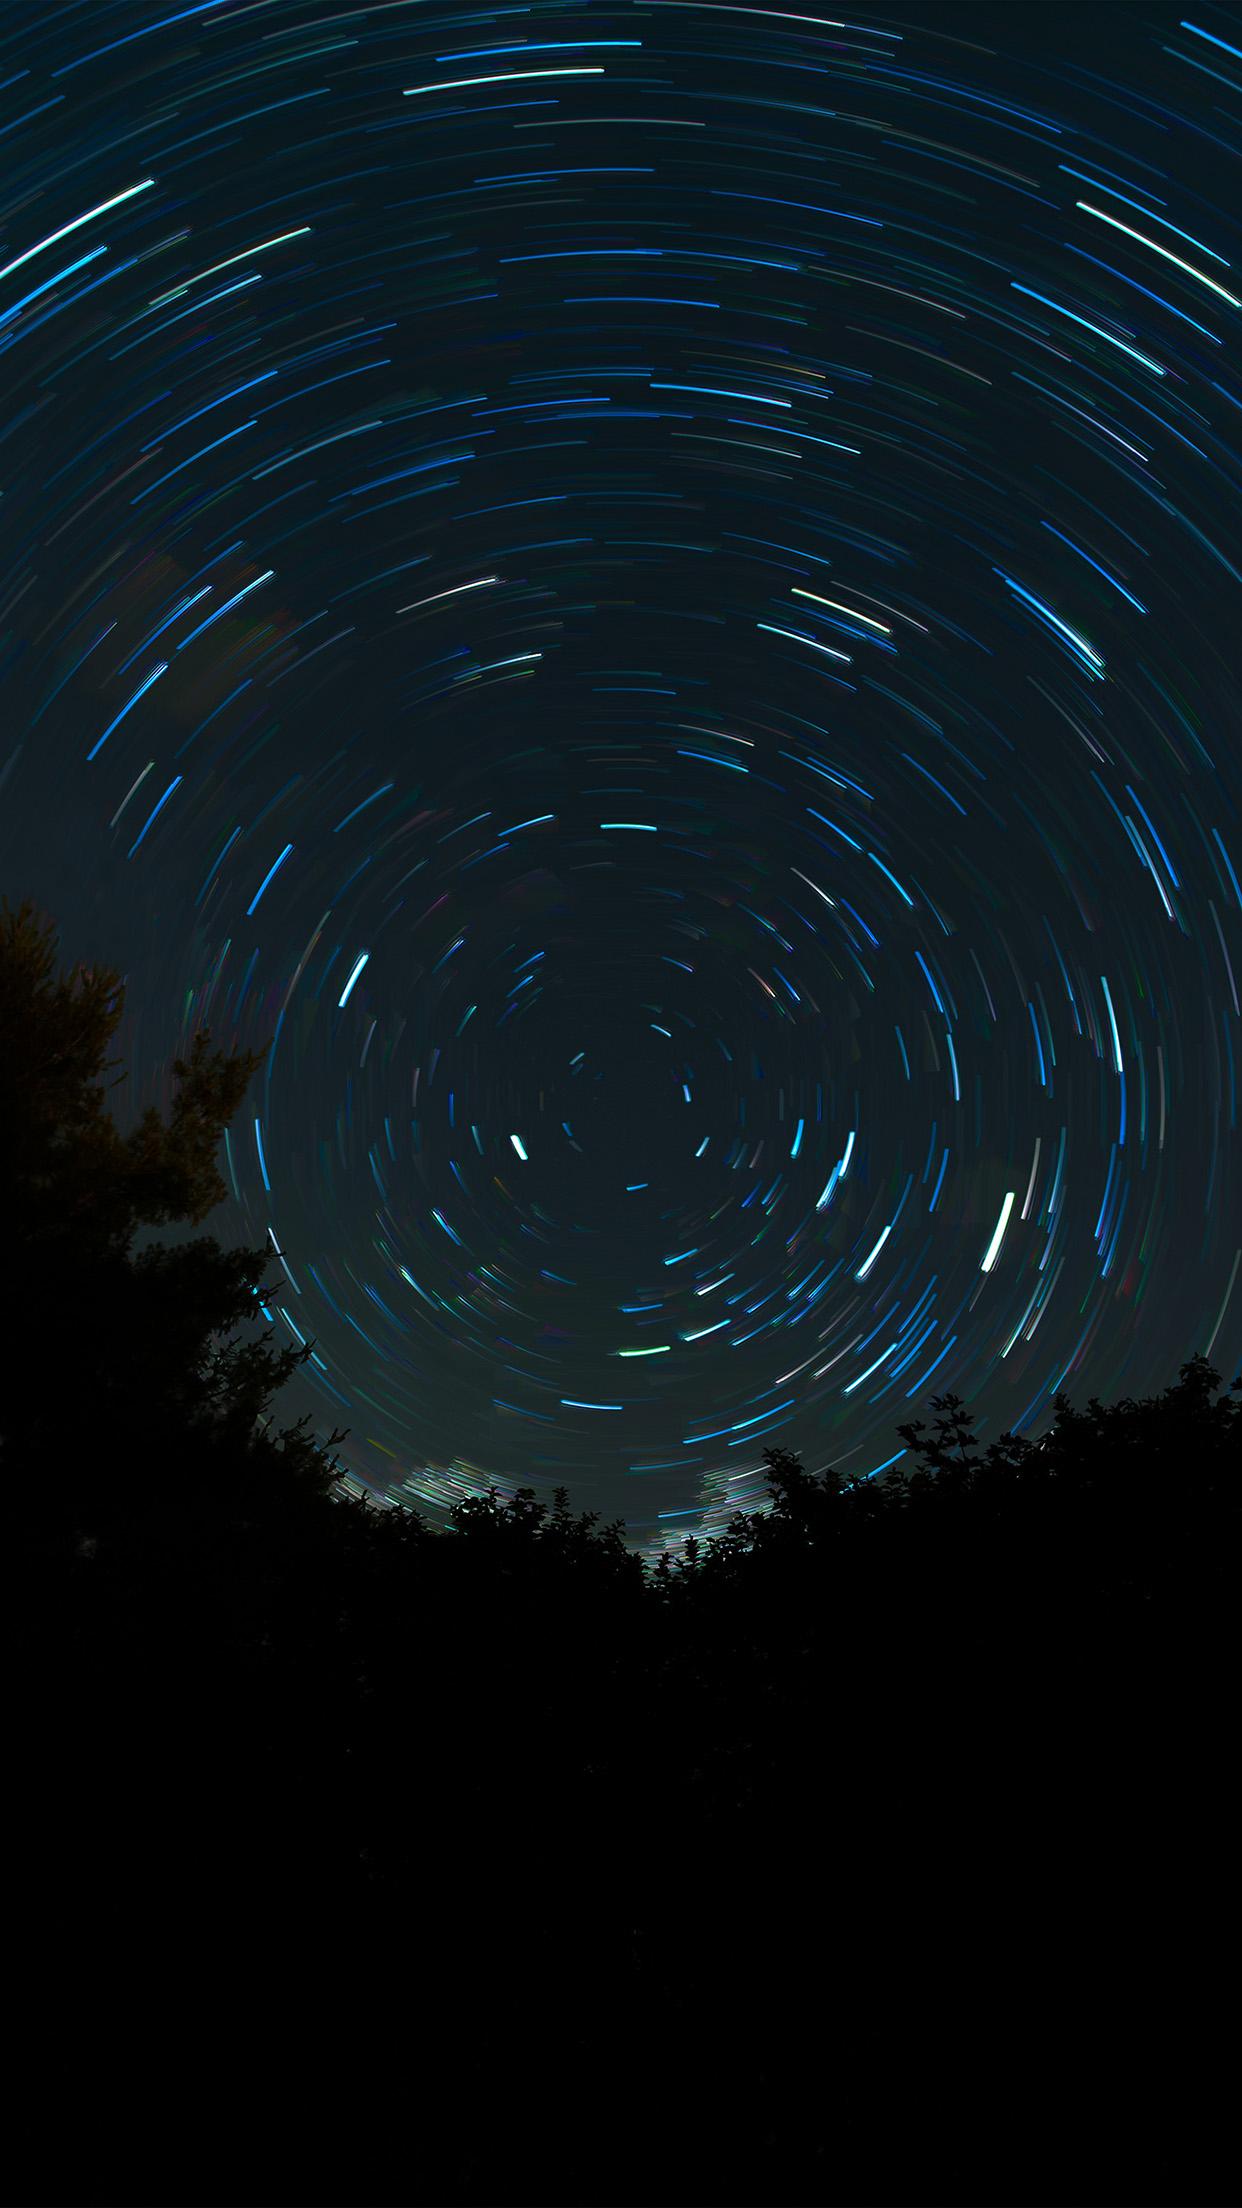 Hd Fall Wallpapers Phone No16 Space Night Sky Circle Dark Wallpaper